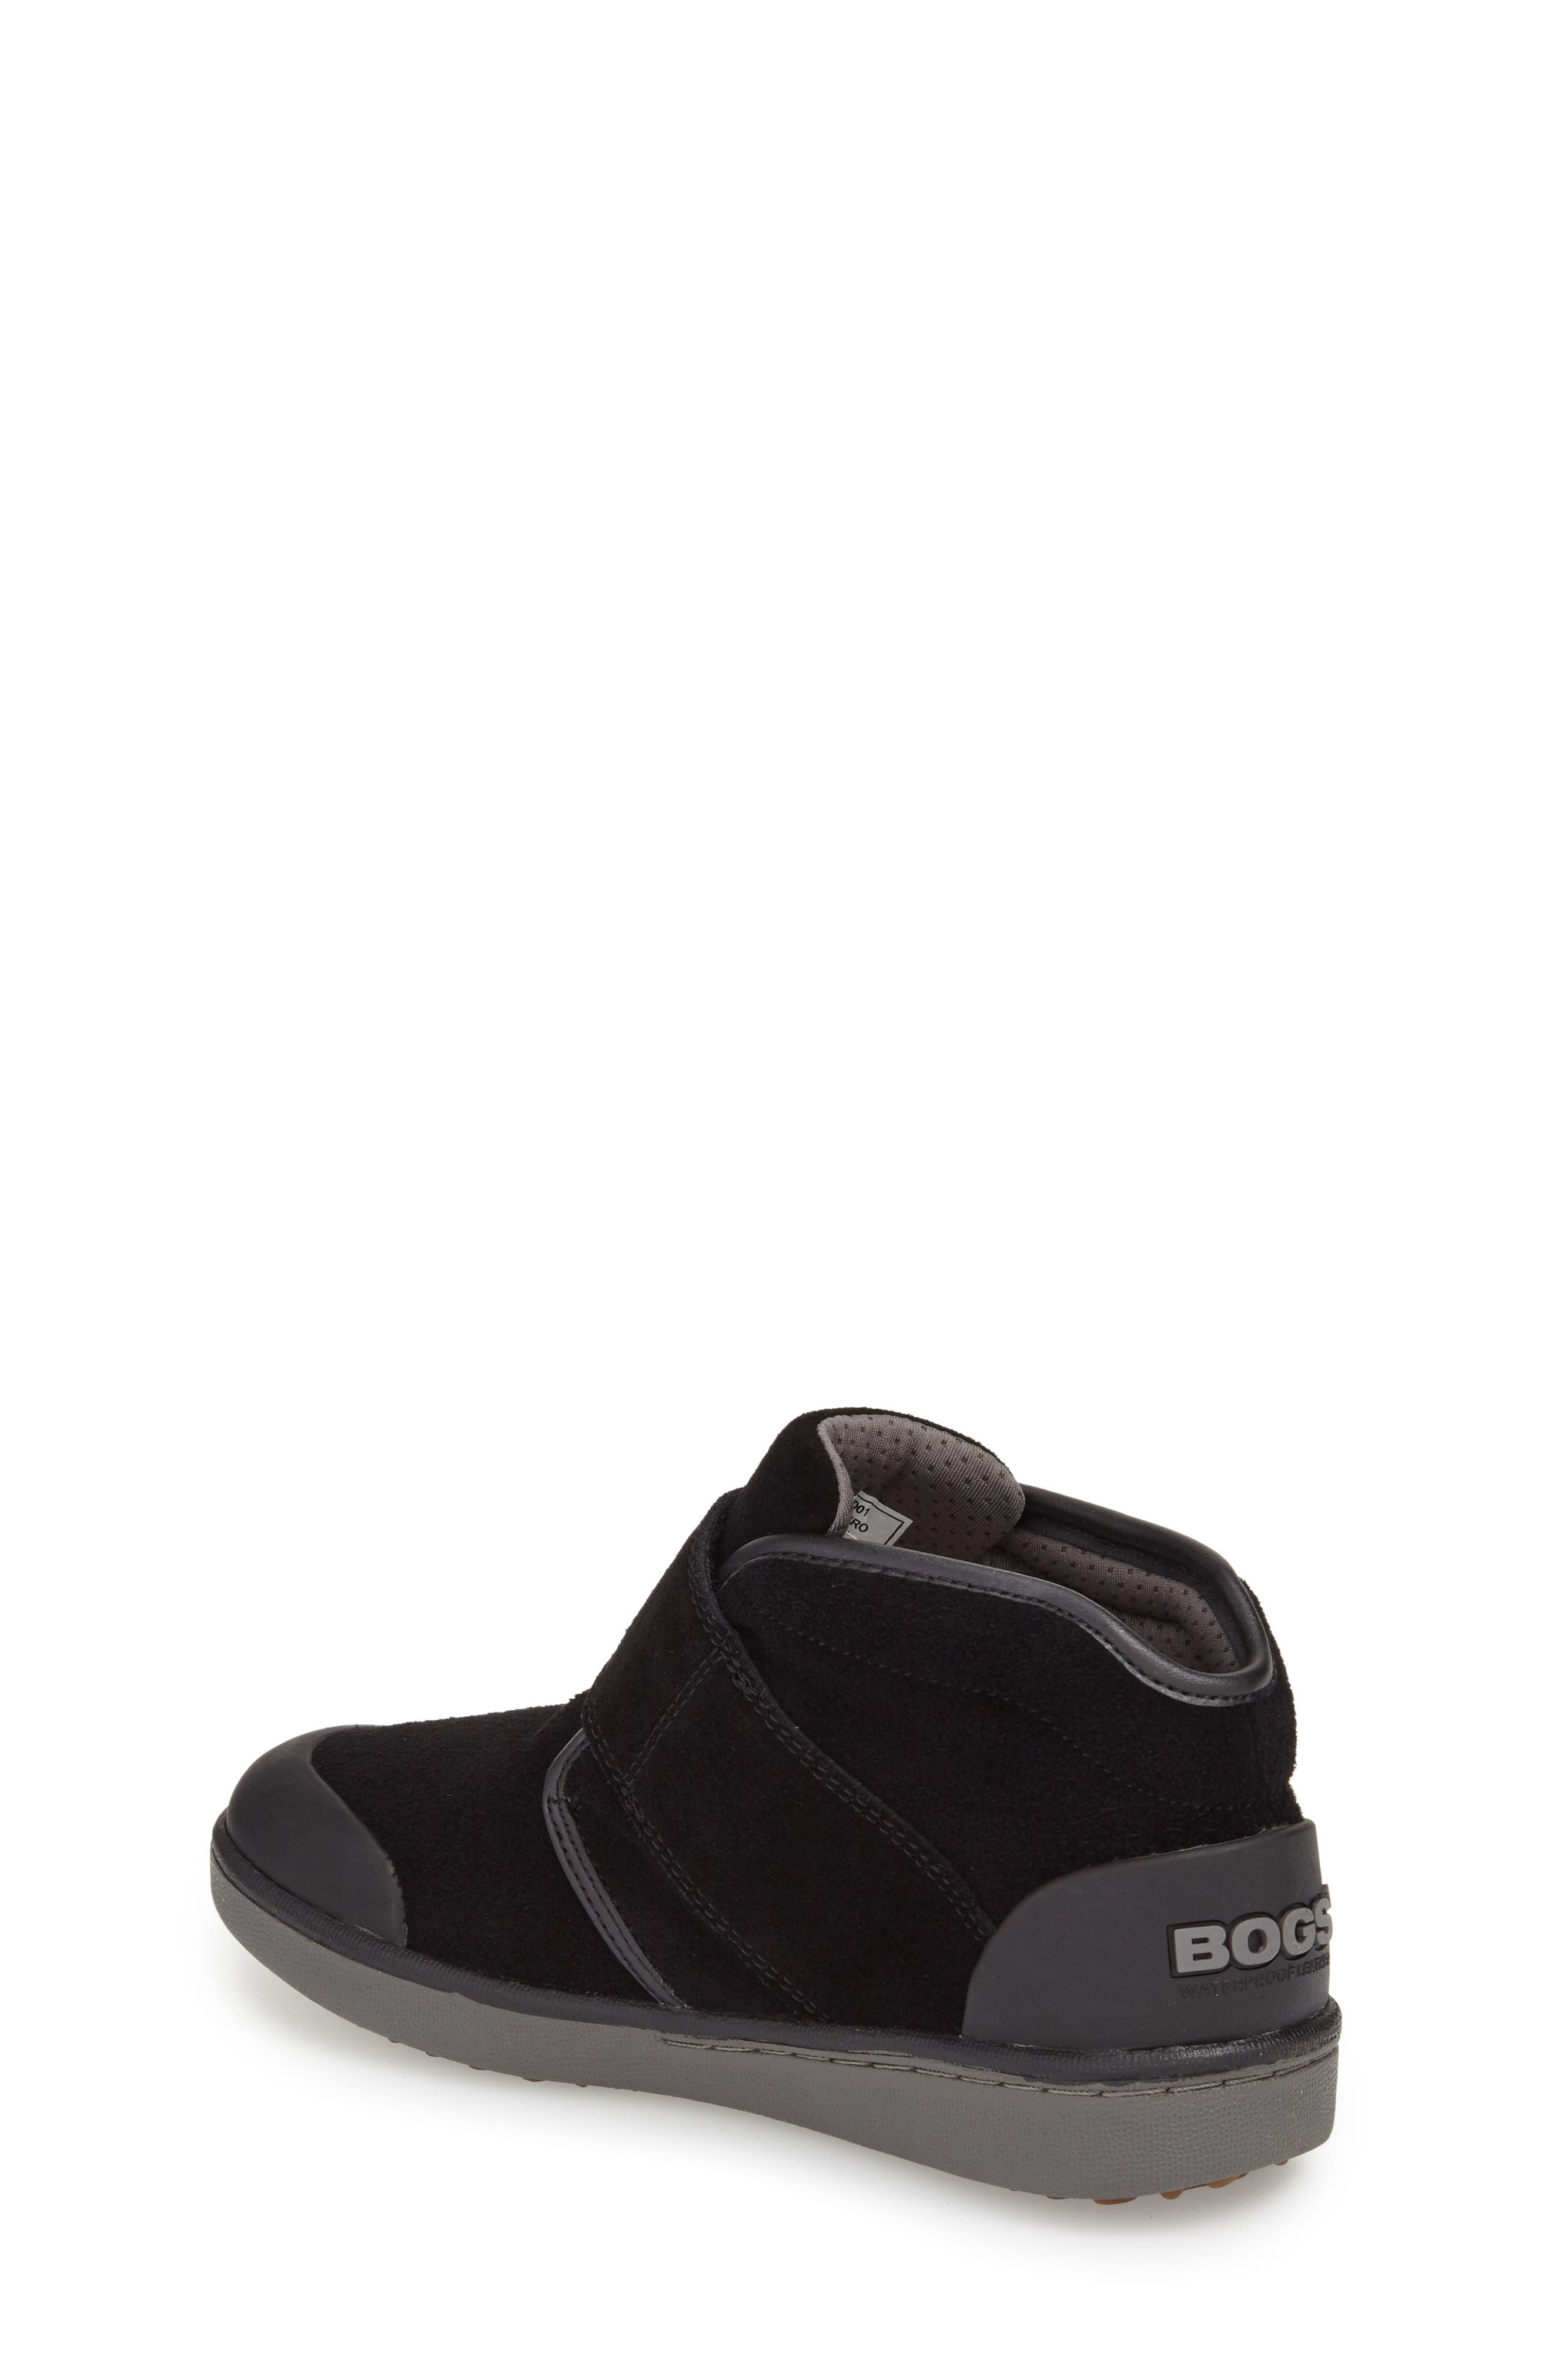 'Sammy' Waterproof Sneaker,                             Alternate thumbnail 2, color,                             BLACK/ BLACK